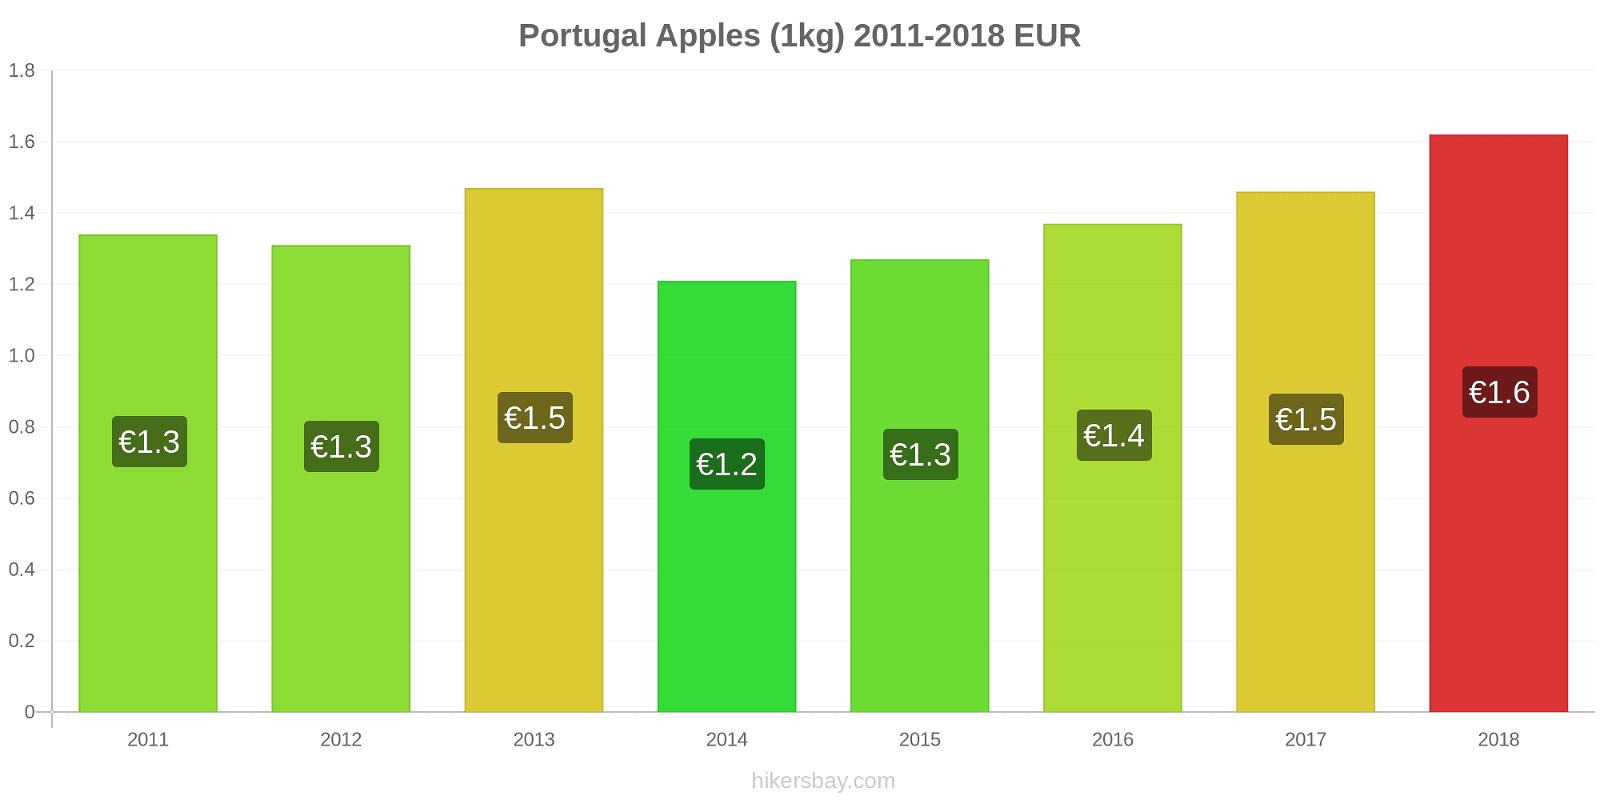 Portugal price changes Apples (1kg) hikersbay.com